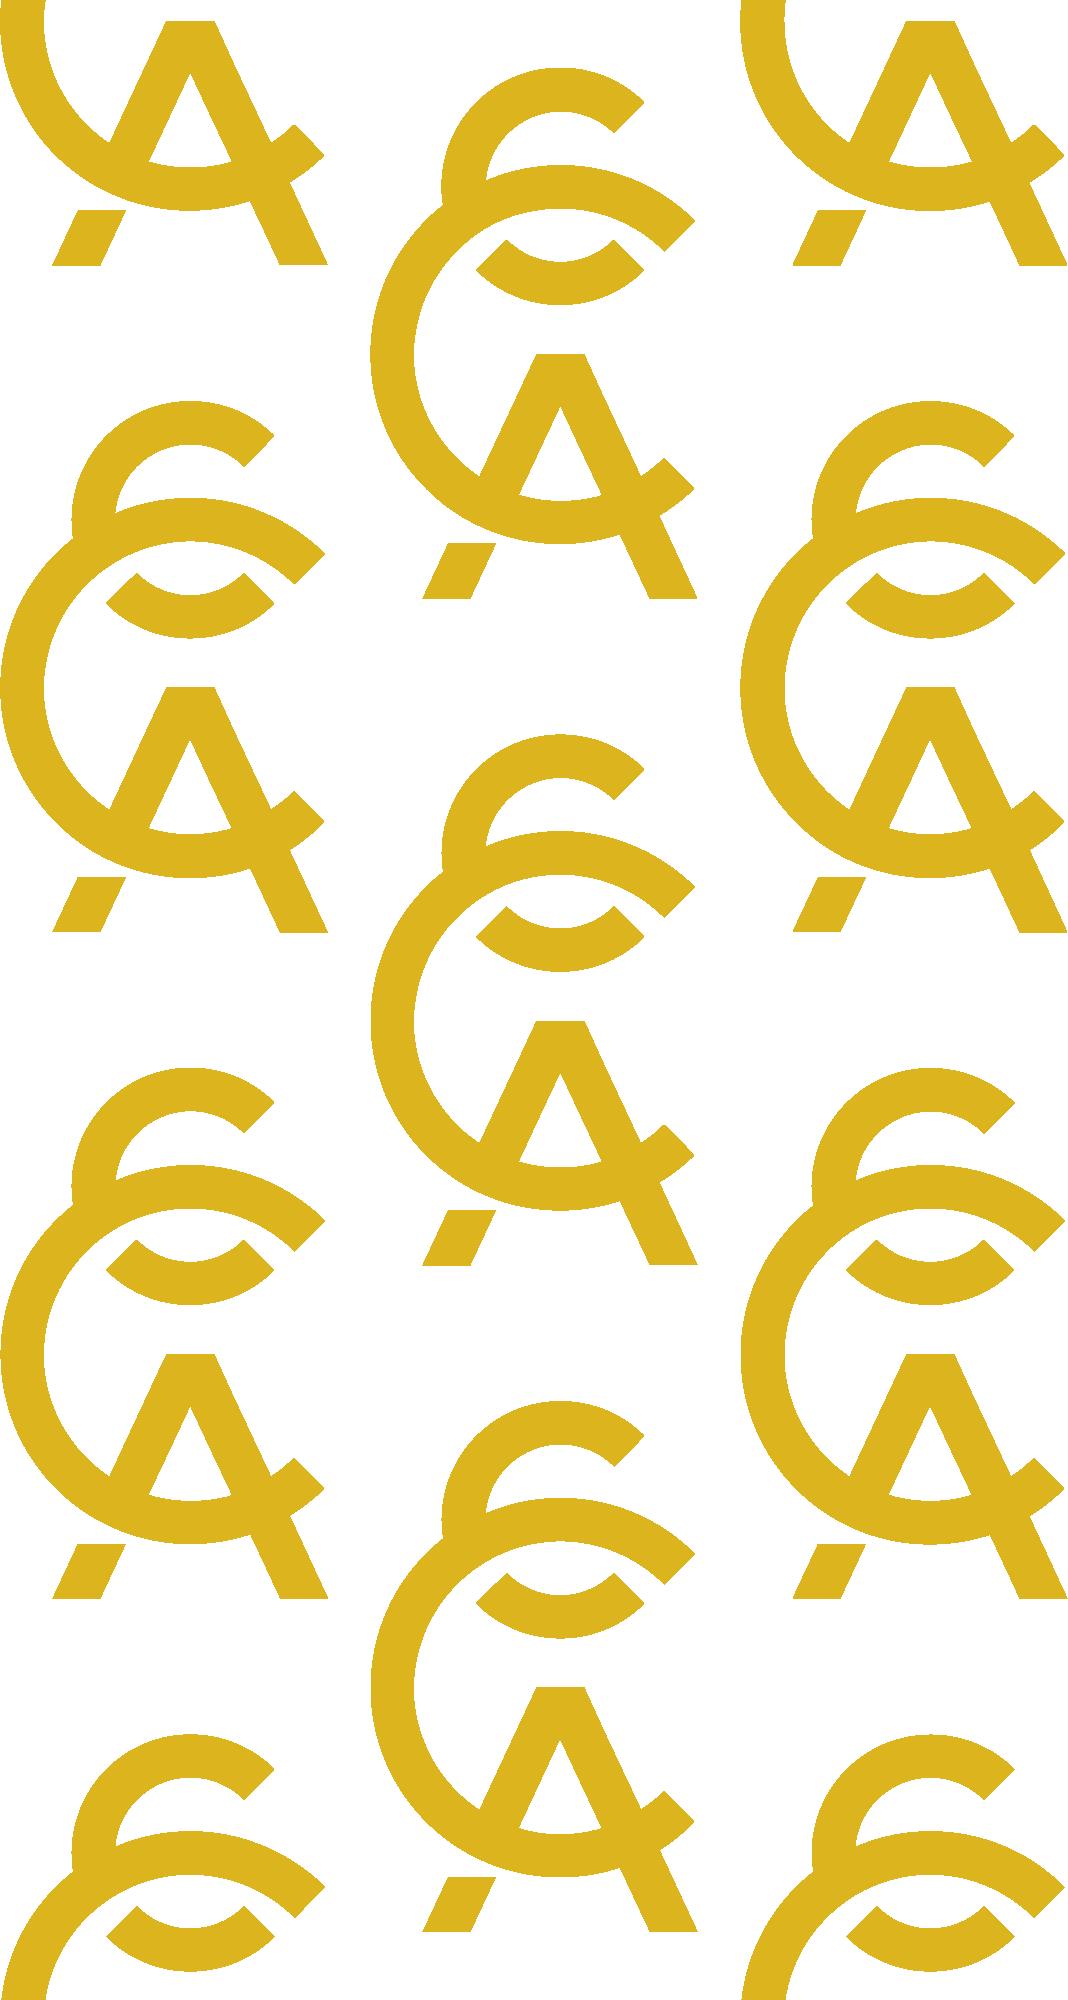 multiple logo or cca